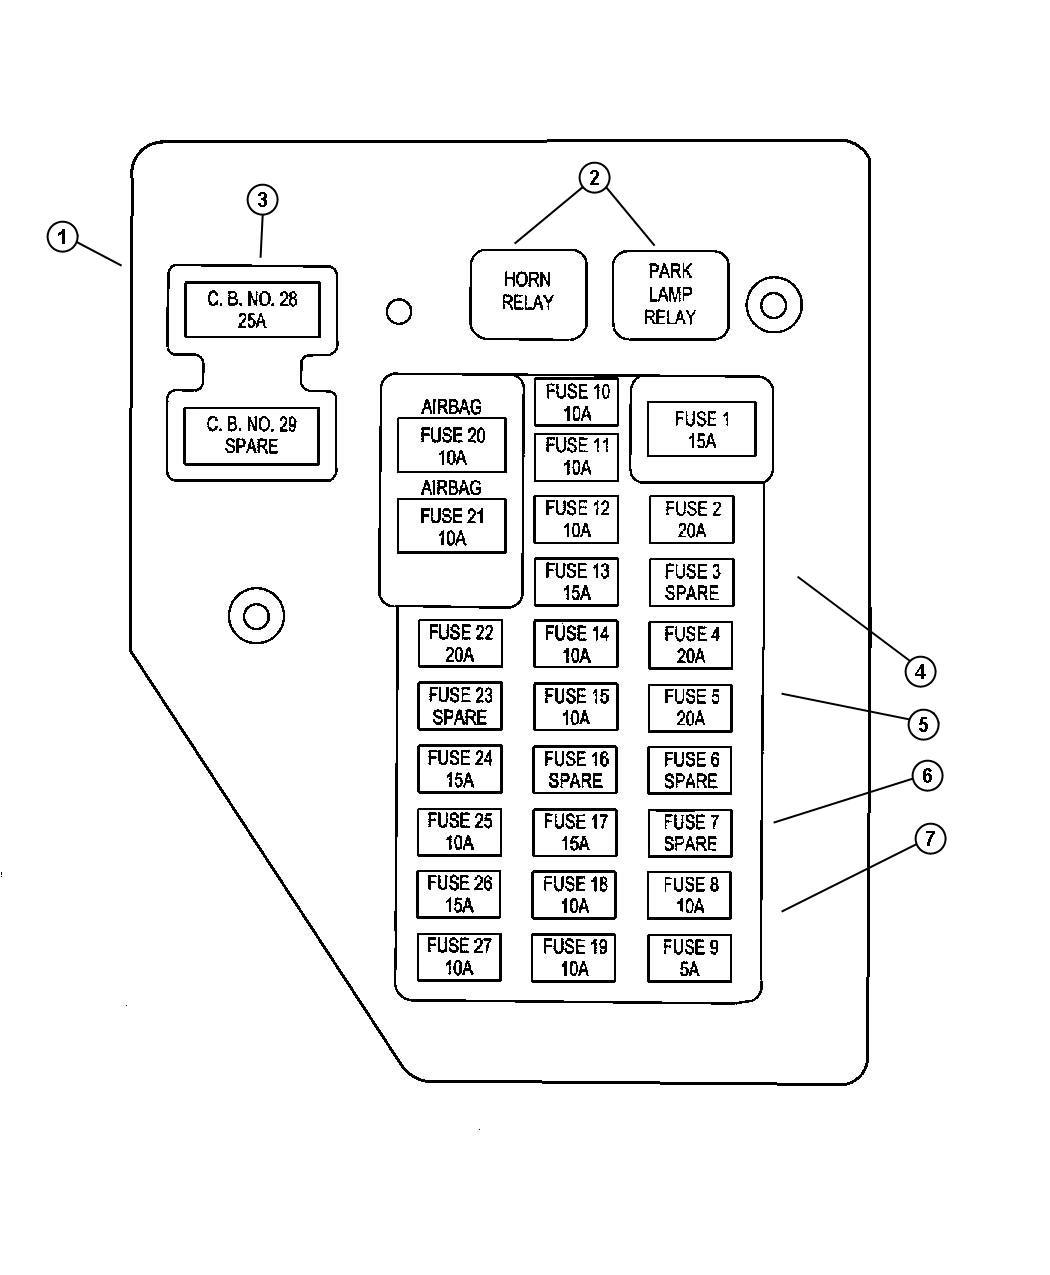 Pleasing 95 Dodge Dakota Fuse Diagram Basic Electronics Wiring Diagram Wiring Cloud Icalpermsplehendilmohammedshrineorg